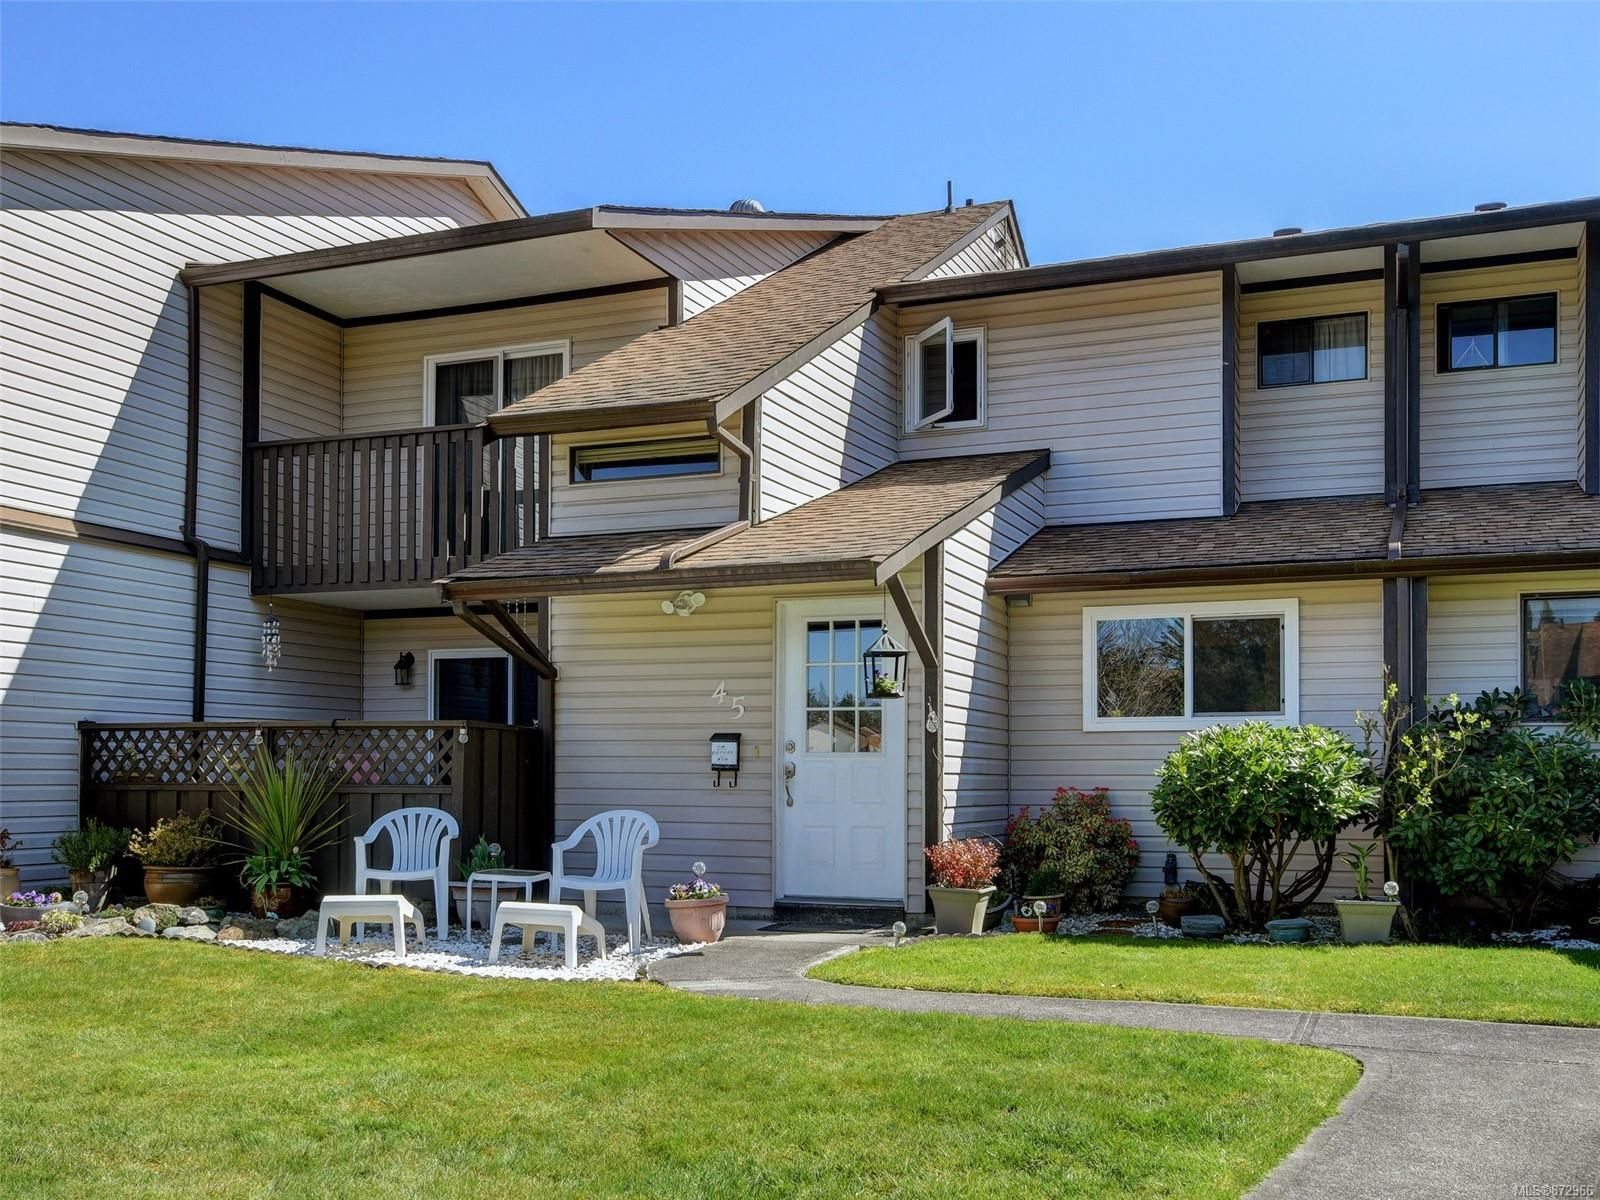 Main Photo: 45 1506 Admirals Rd in : Es Gorge Vale Row/Townhouse for sale (Esquimalt)  : MLS®# 872966